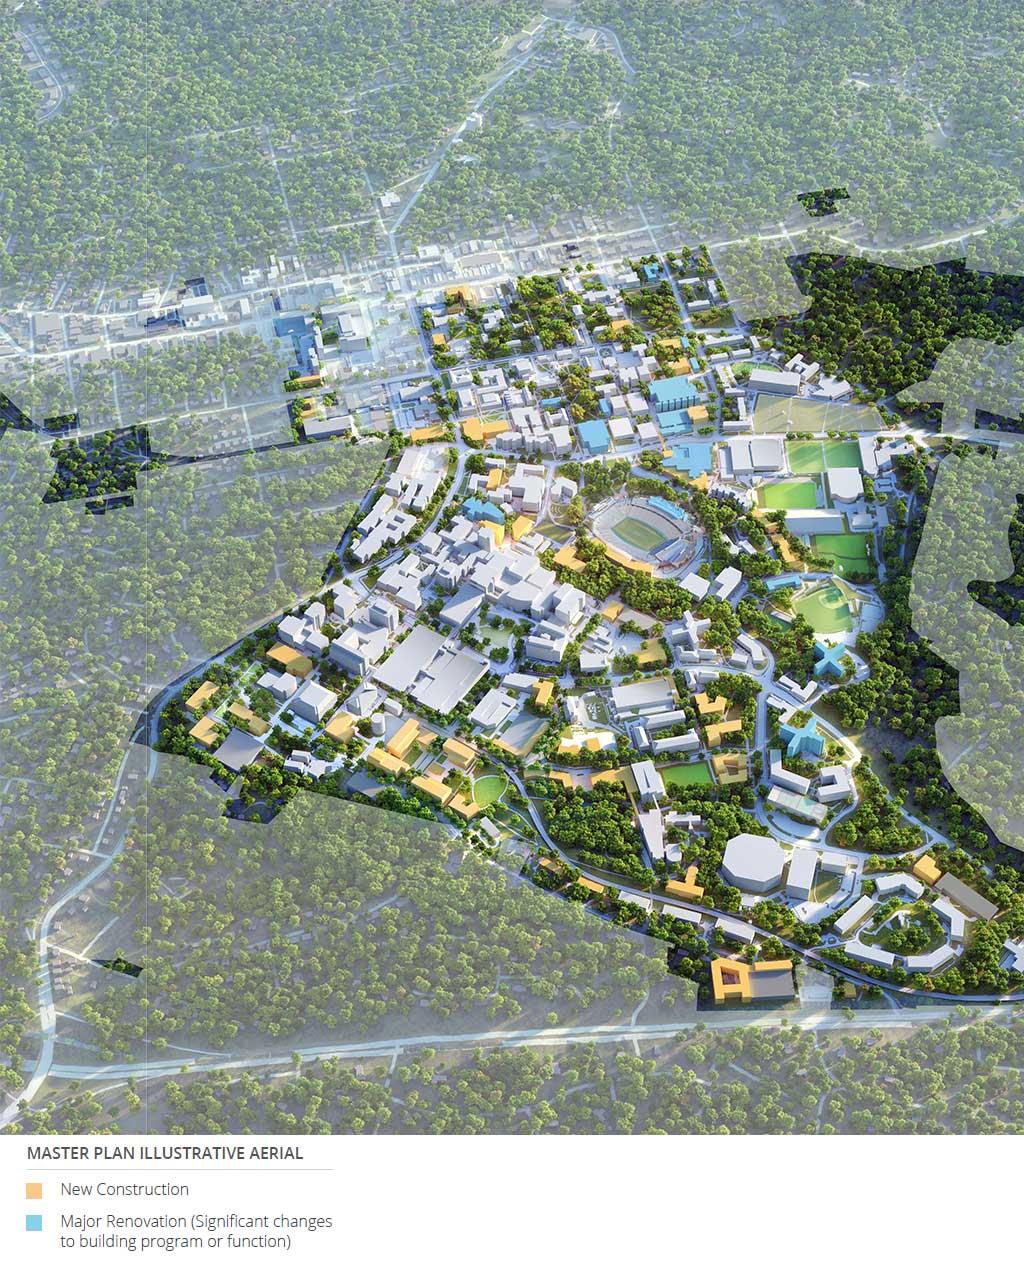 Master Plan Illustrative Aerial Map